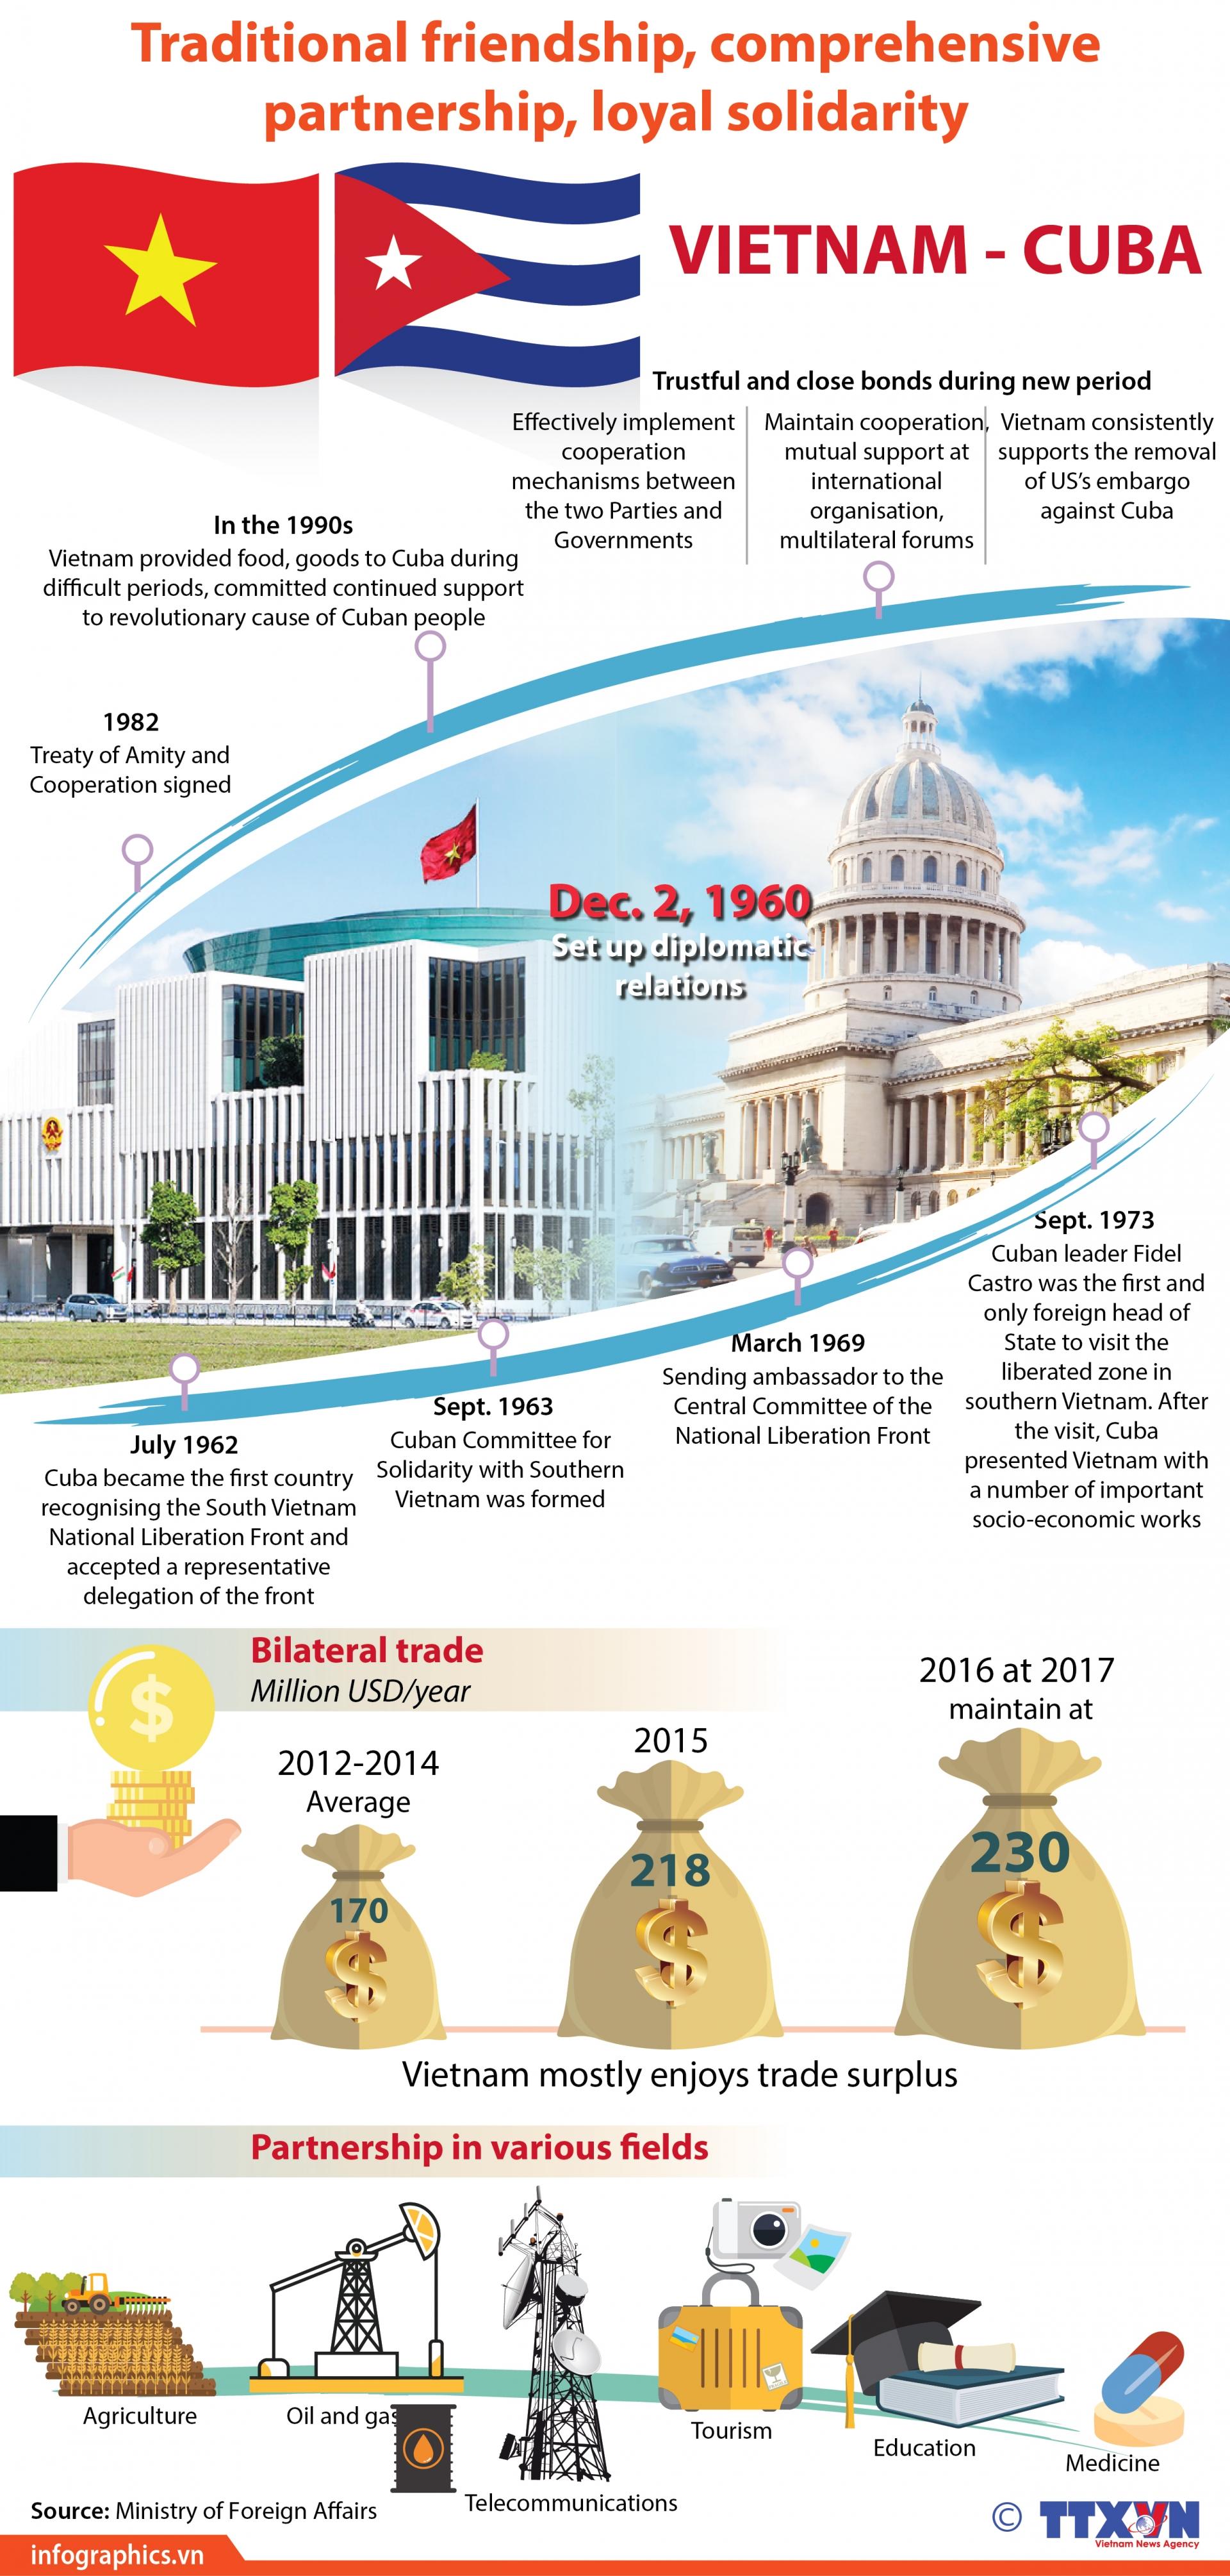 vietnam cuba enjoy loyal solidarity through historical periods